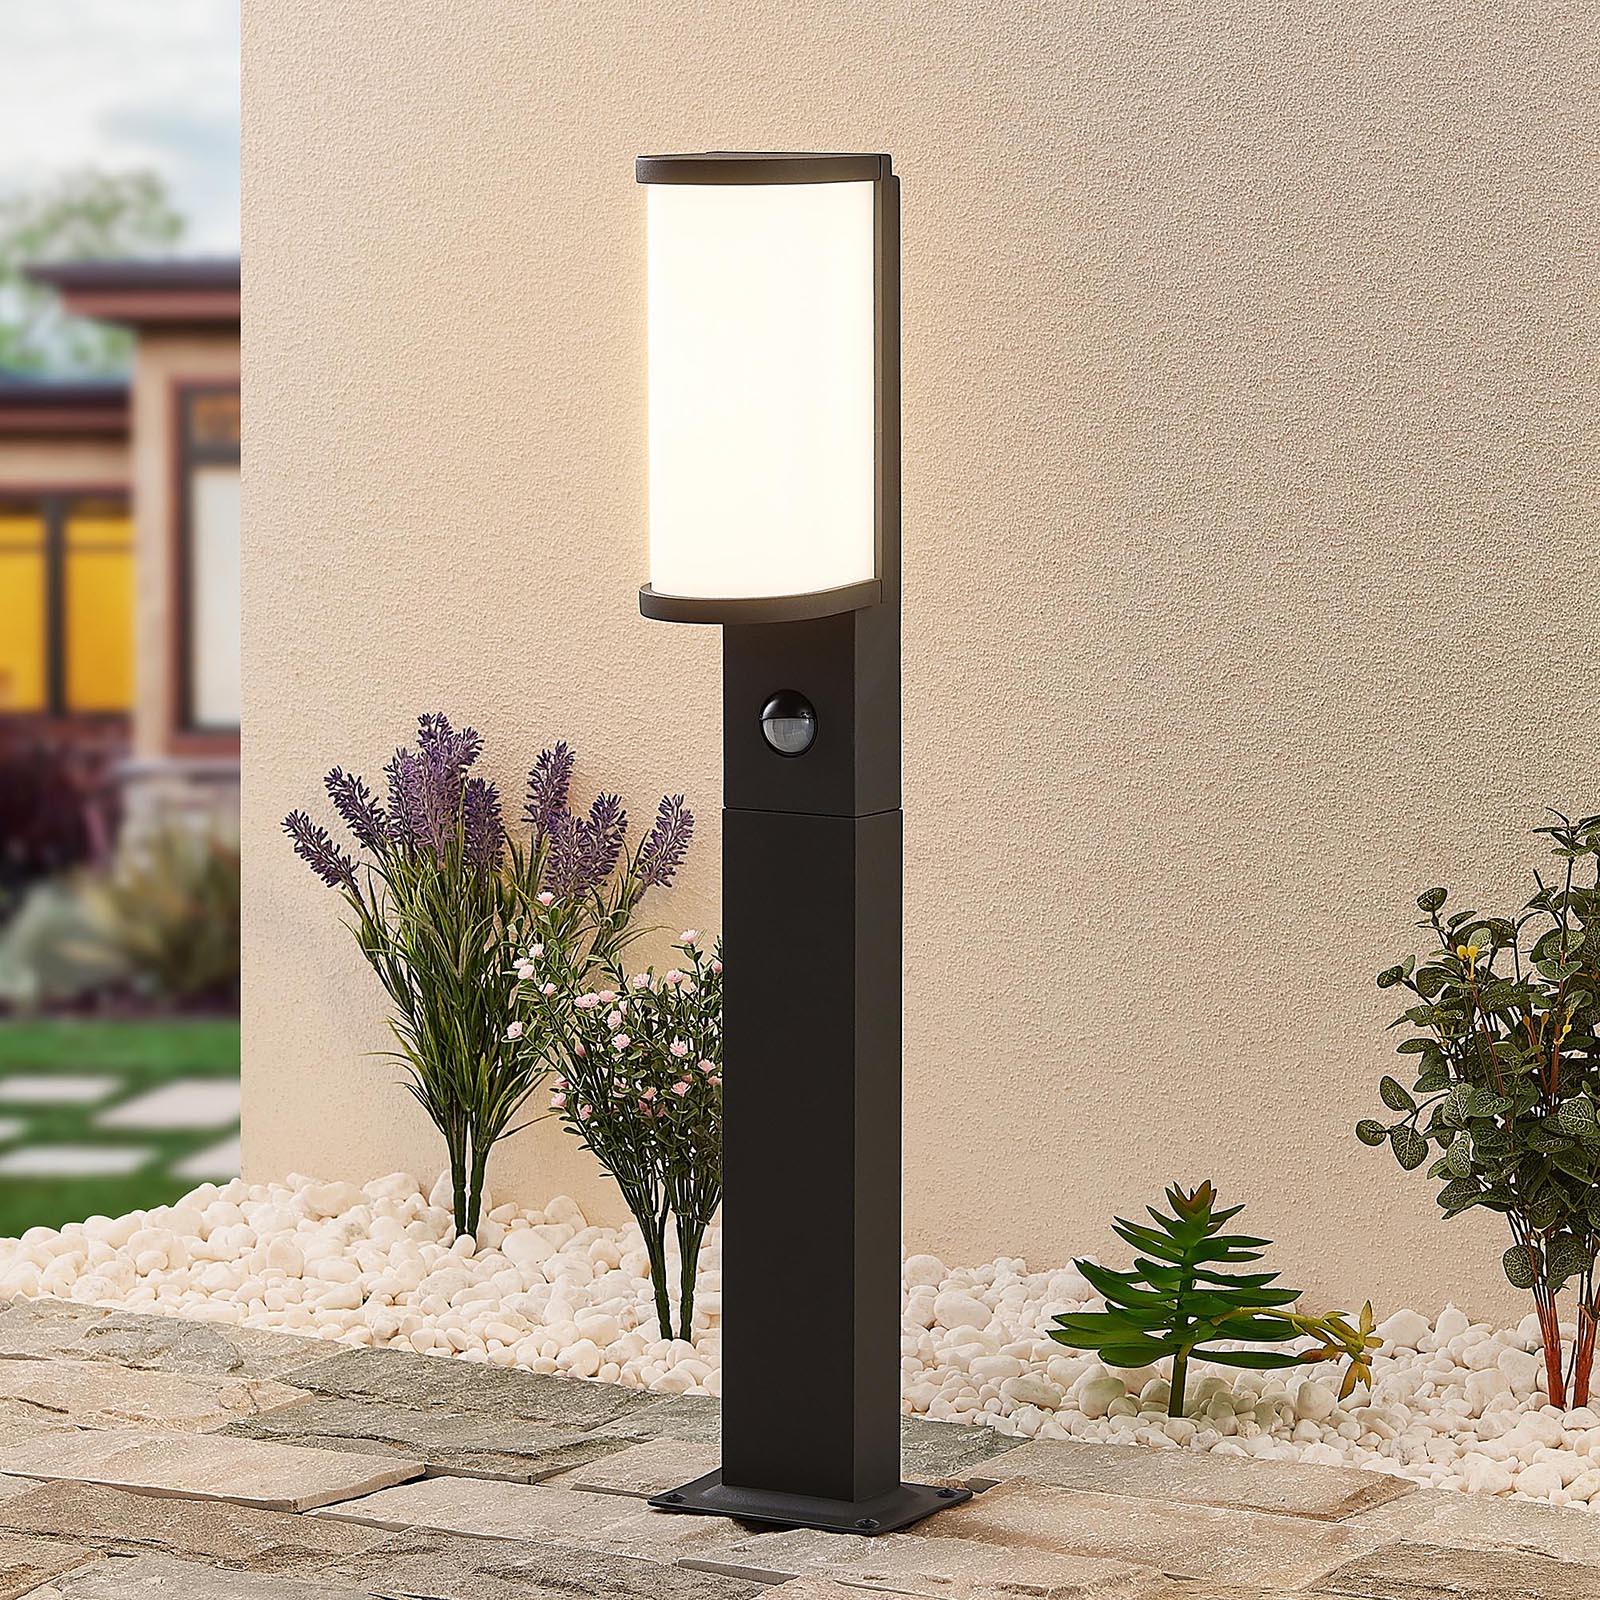 Lucande Jokum LED-Wegelampe, IP54, 60 cm, Sensor